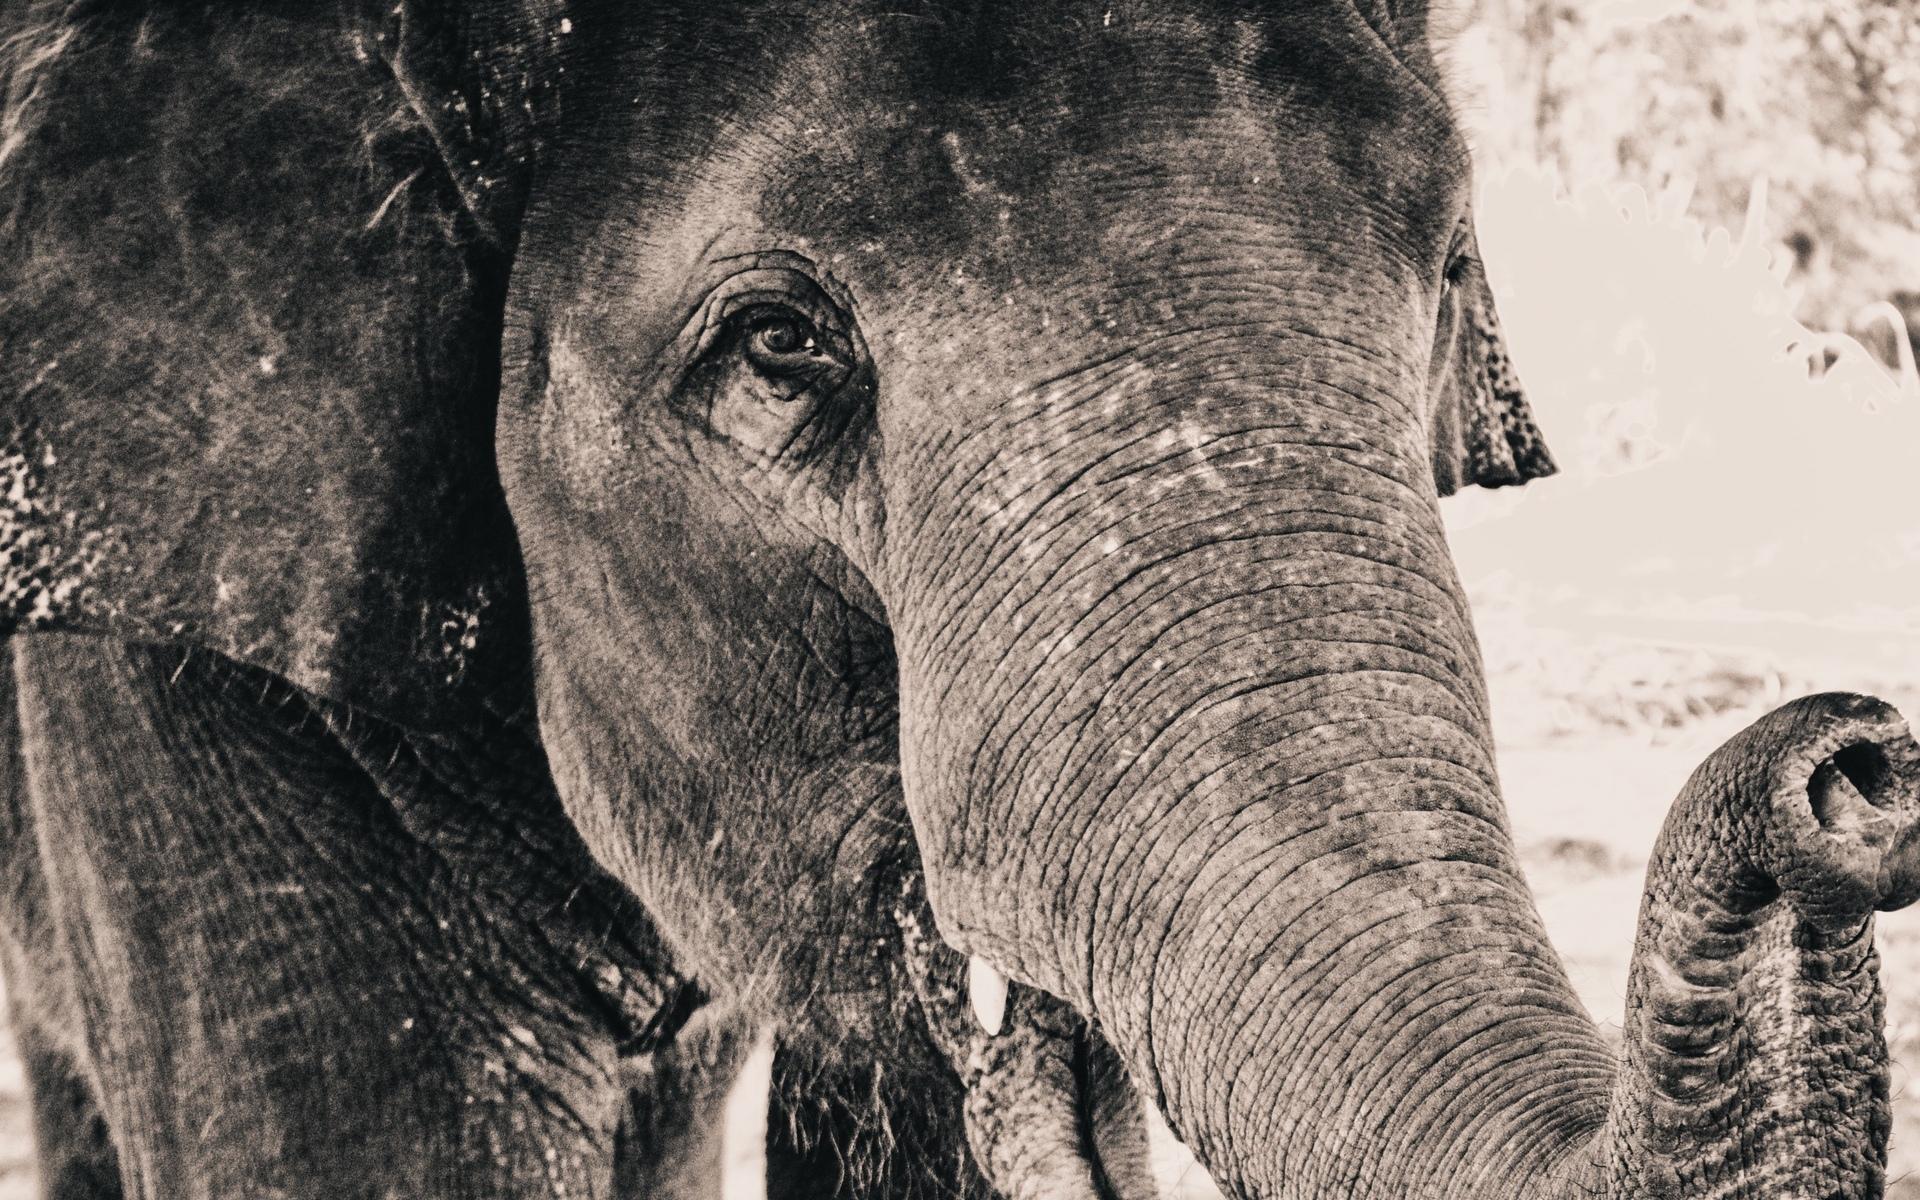 животное, слон, чб фото, макро